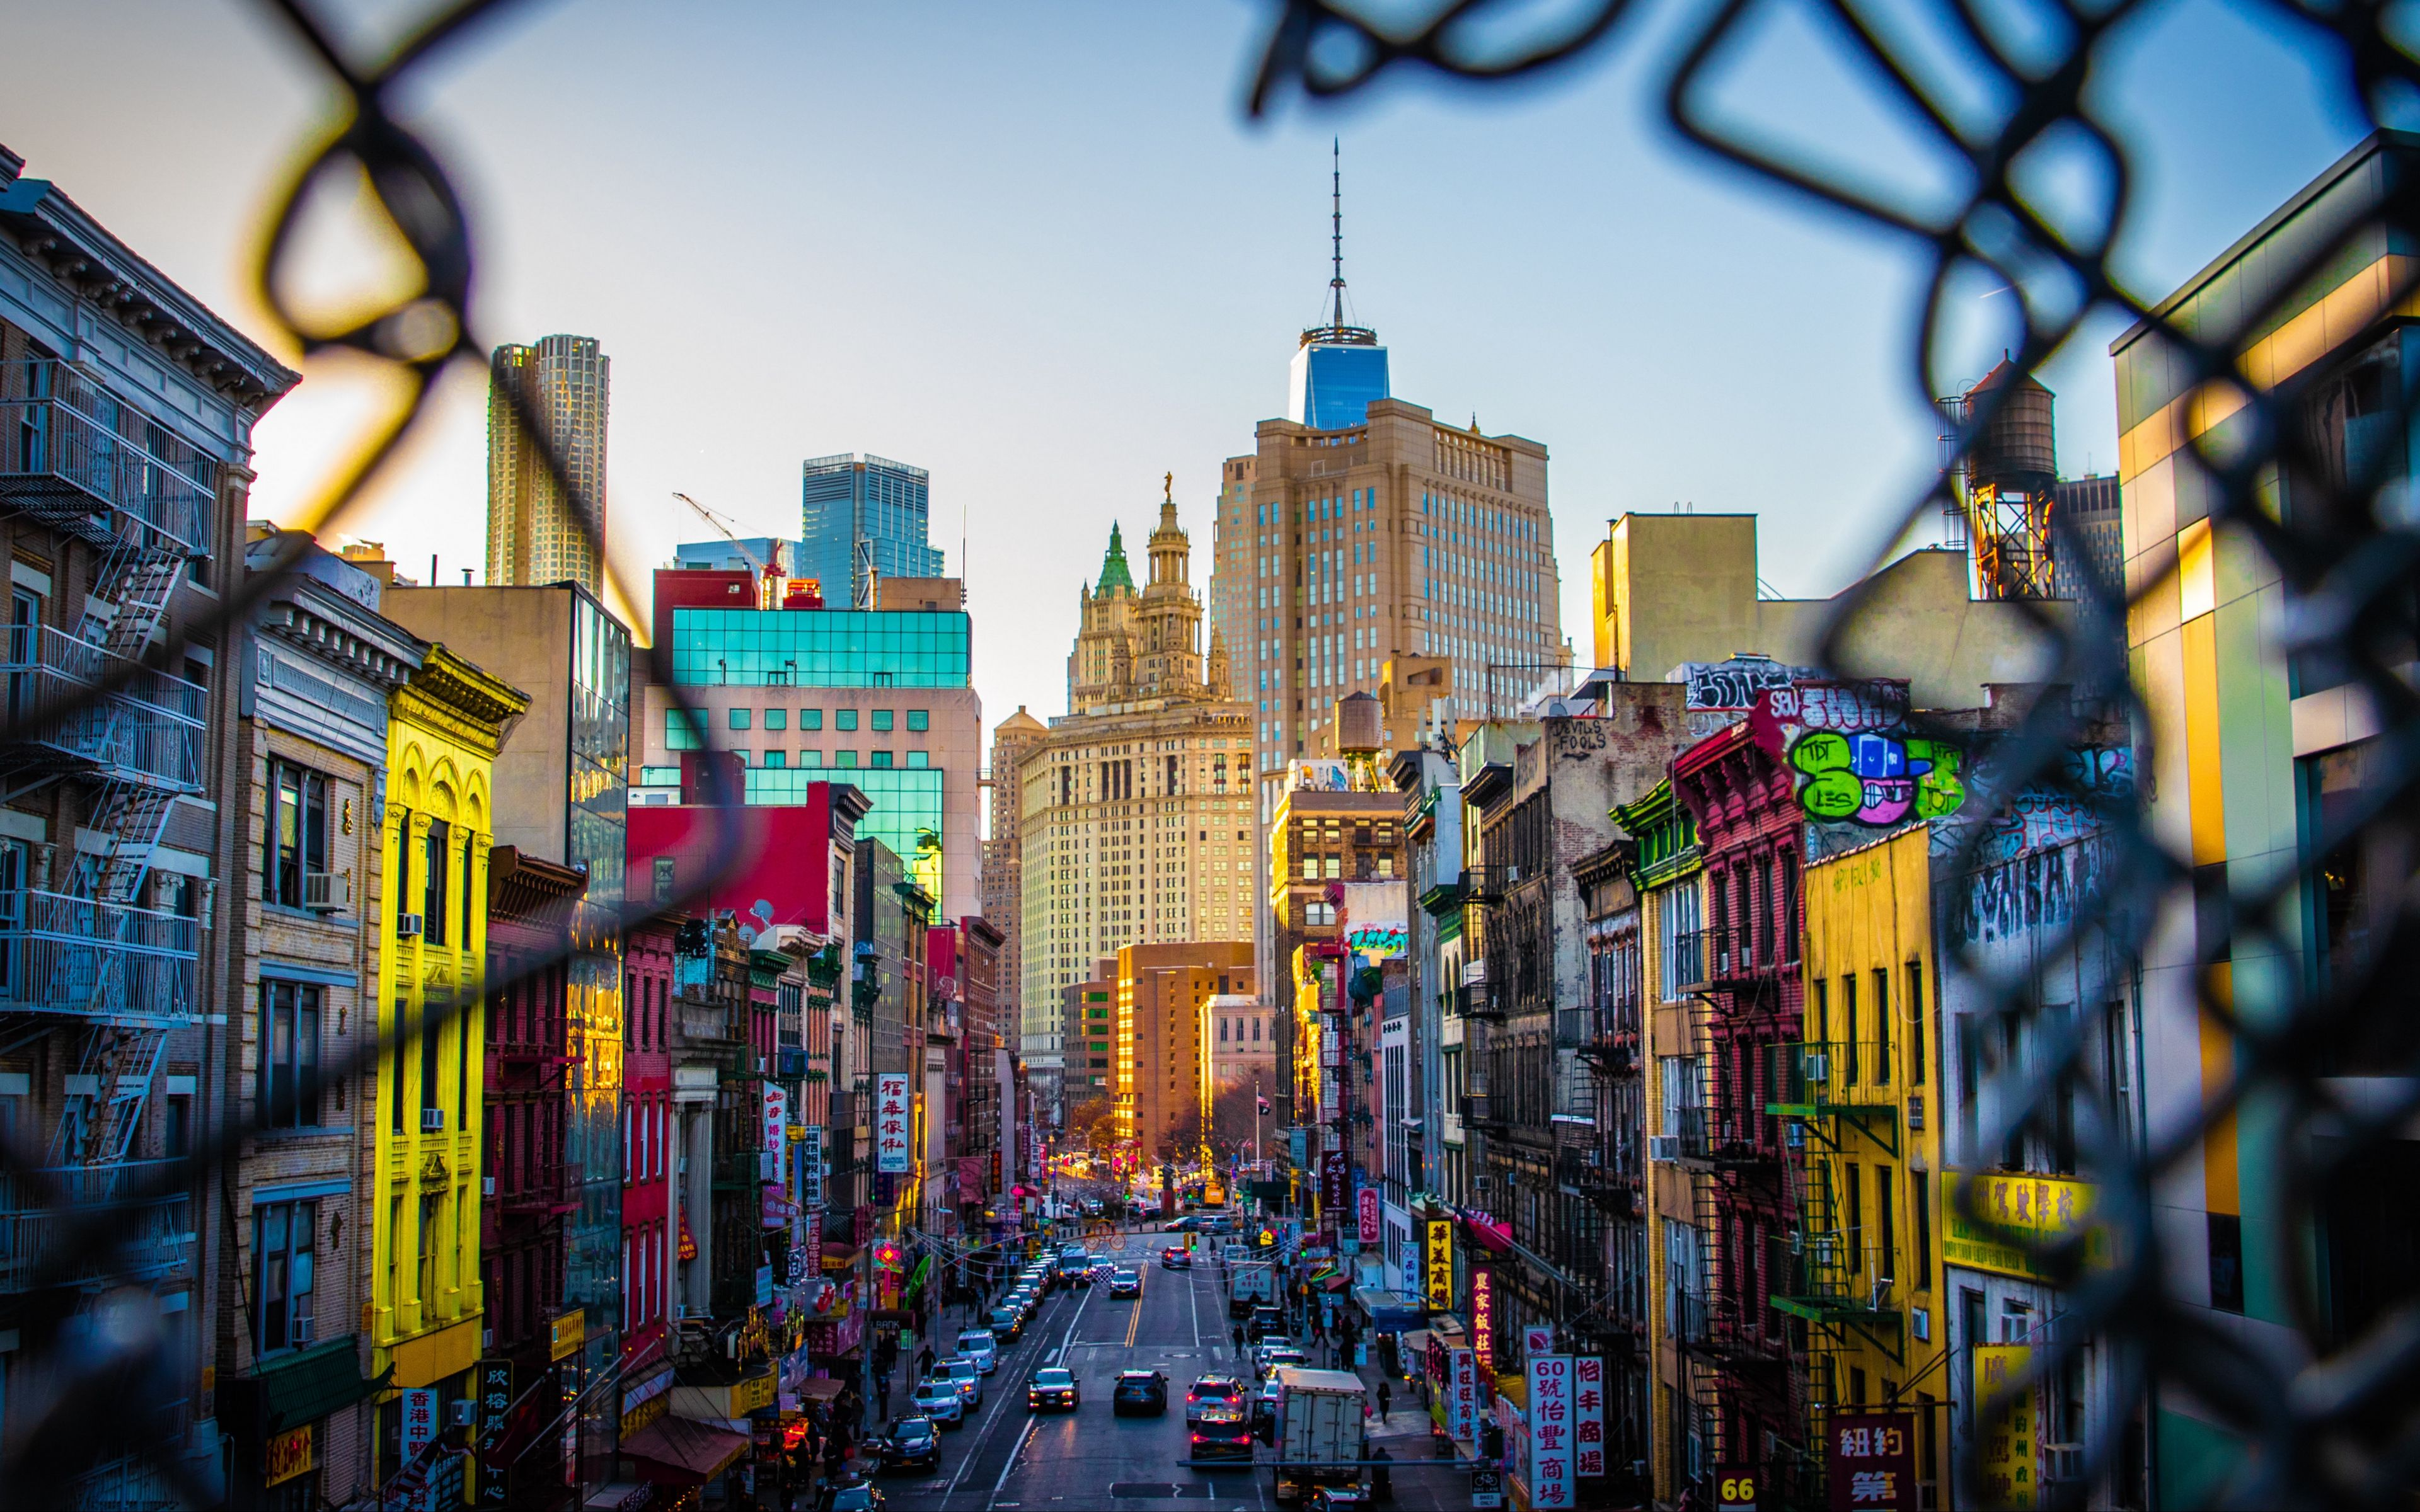 Wallpaper City in movement